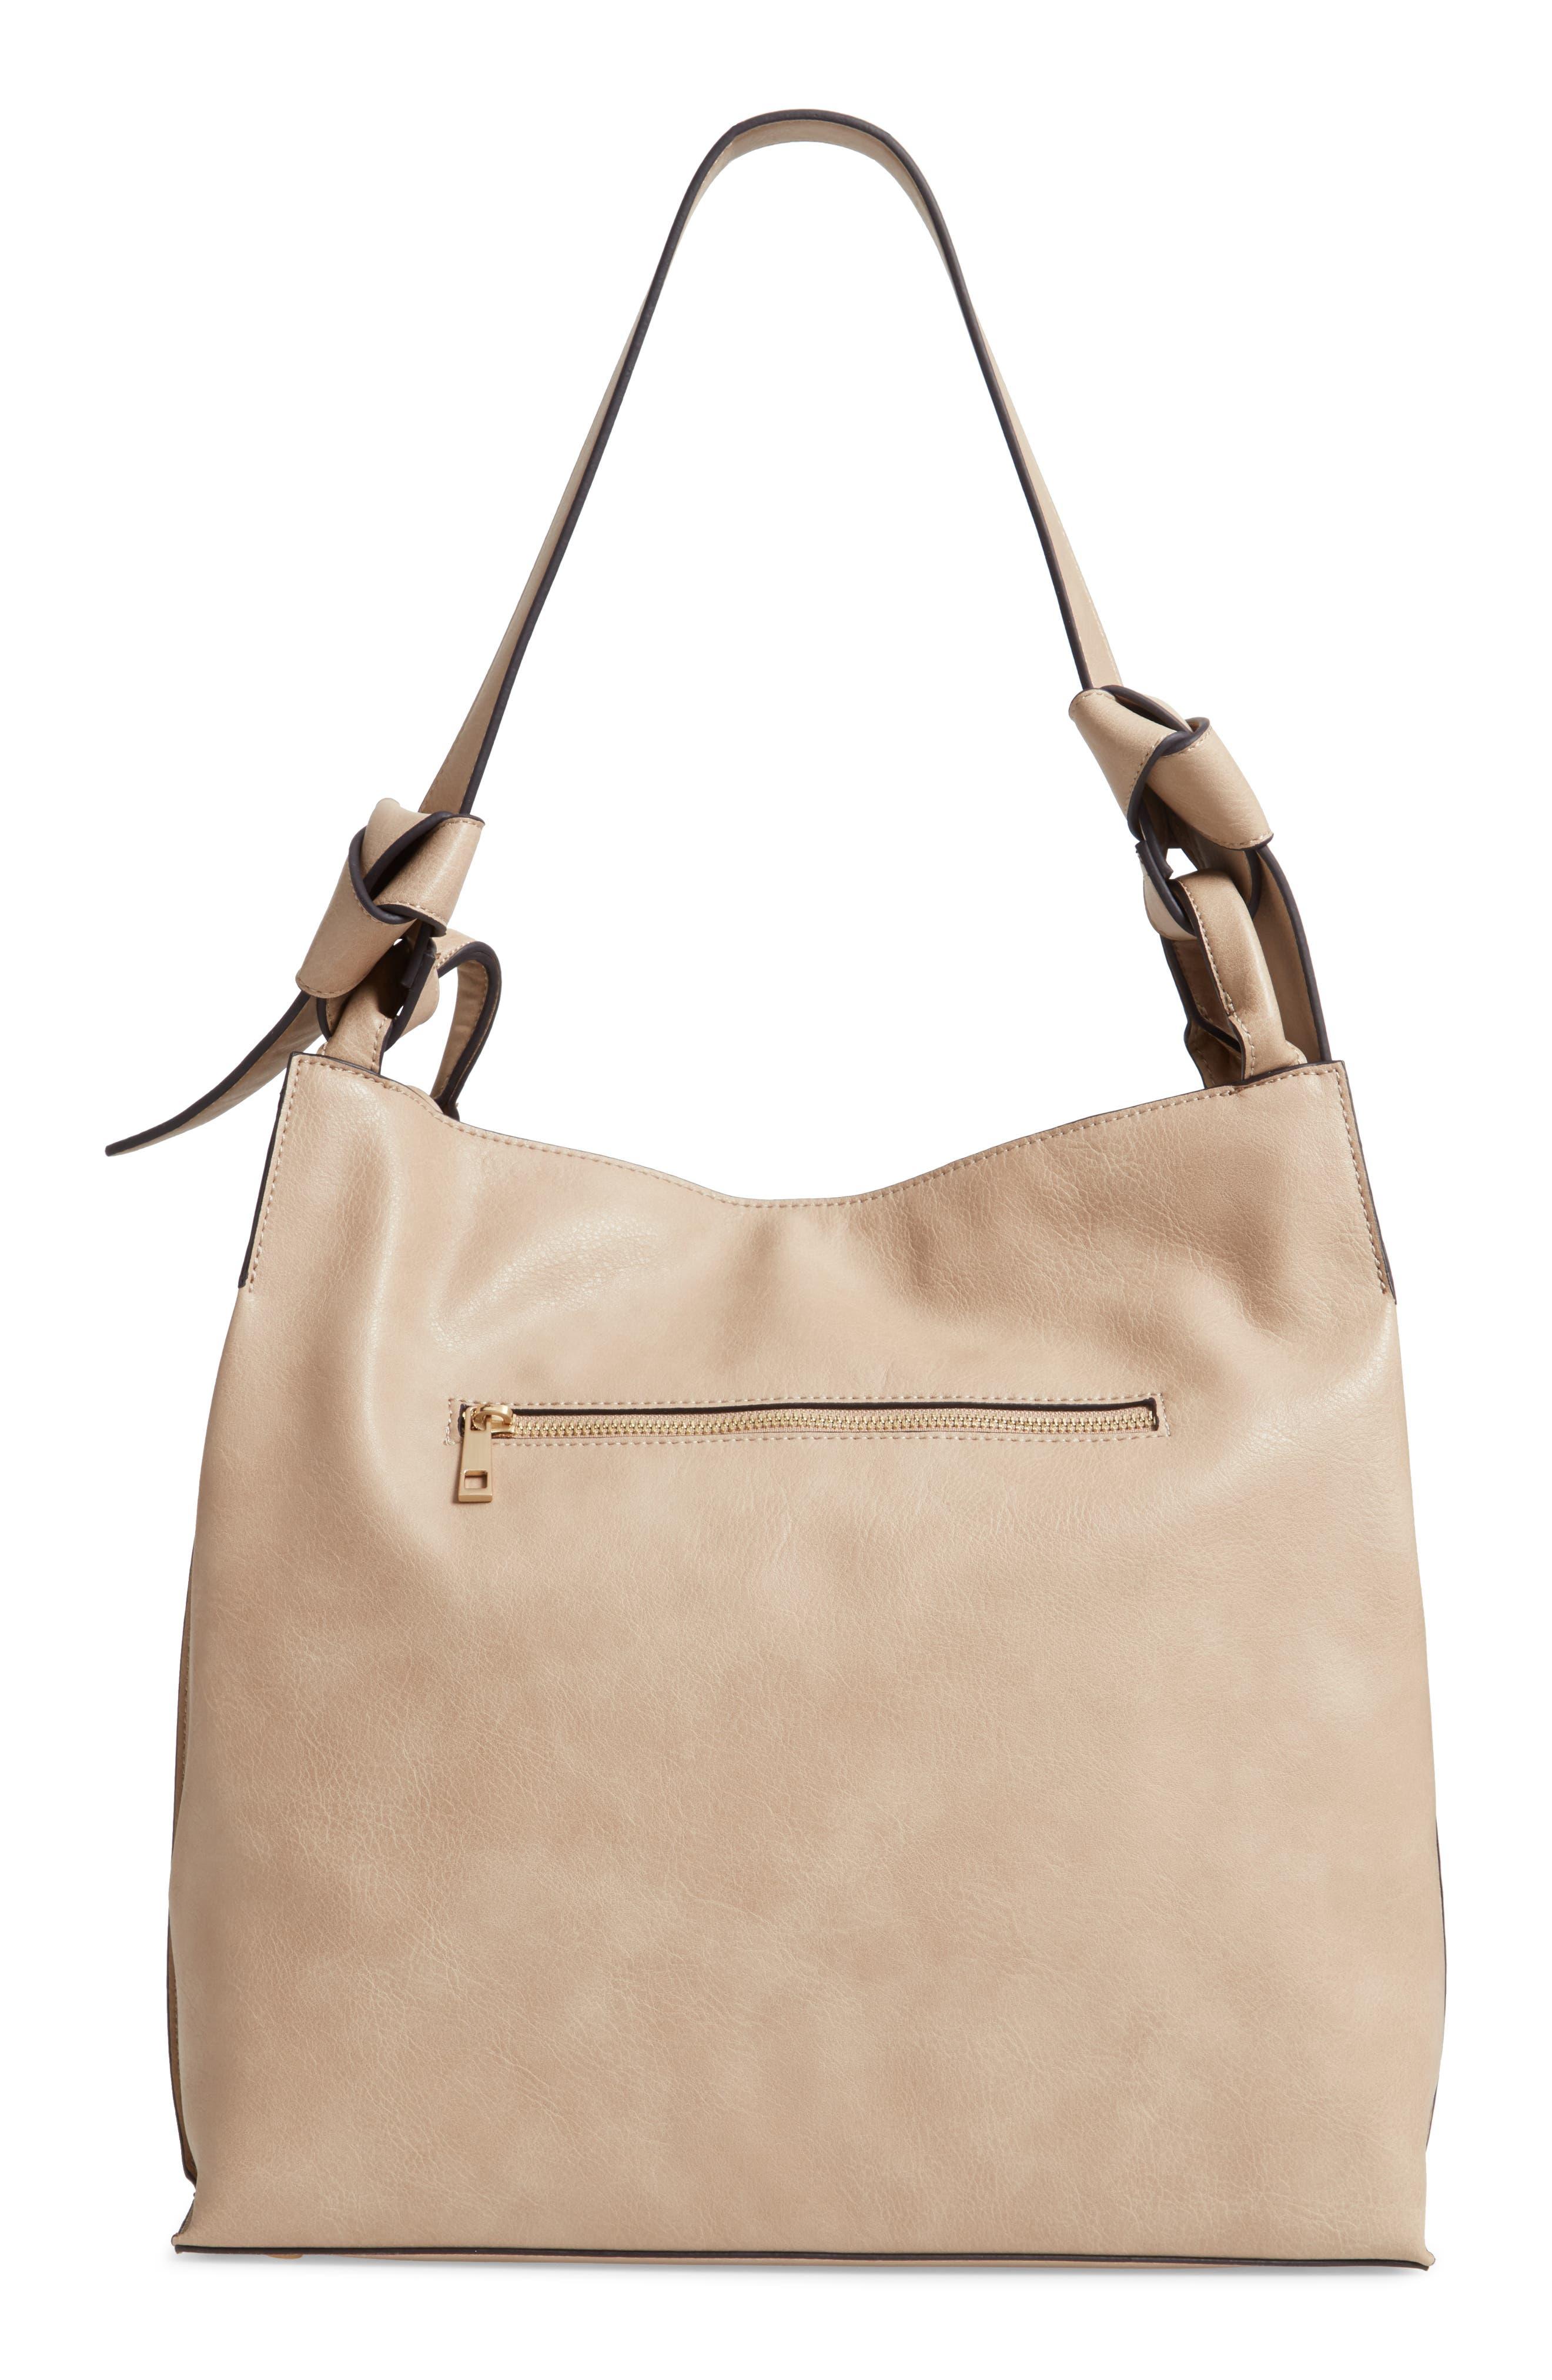 Josah Faux Leather Shoulder Bag,                             Alternate thumbnail 4, color,                             SAFARI